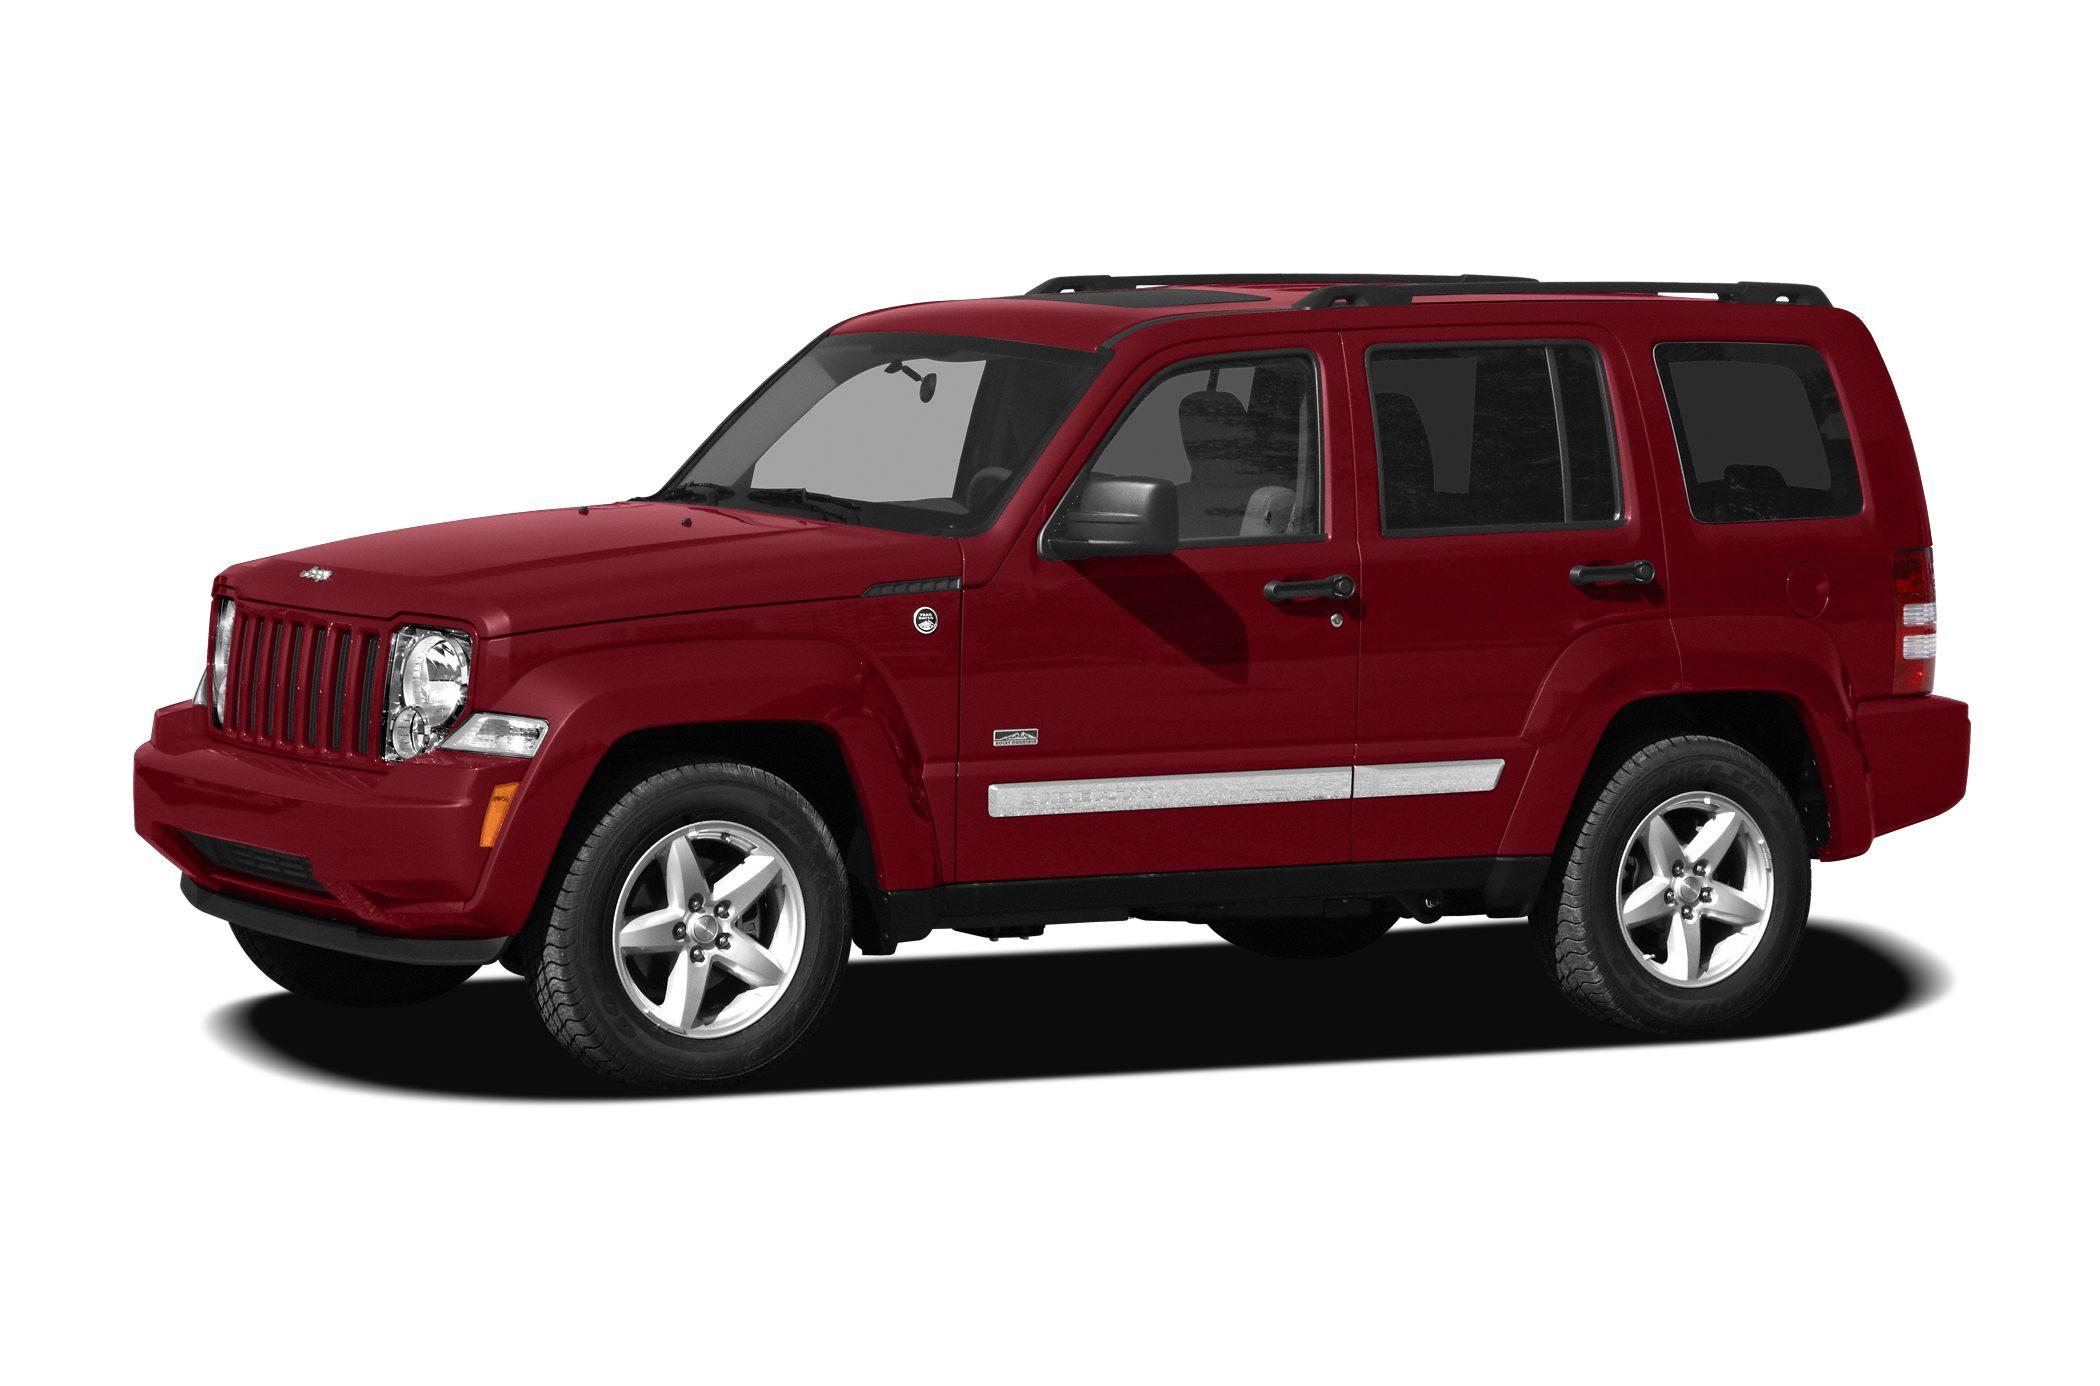 2009 jeep liberty information